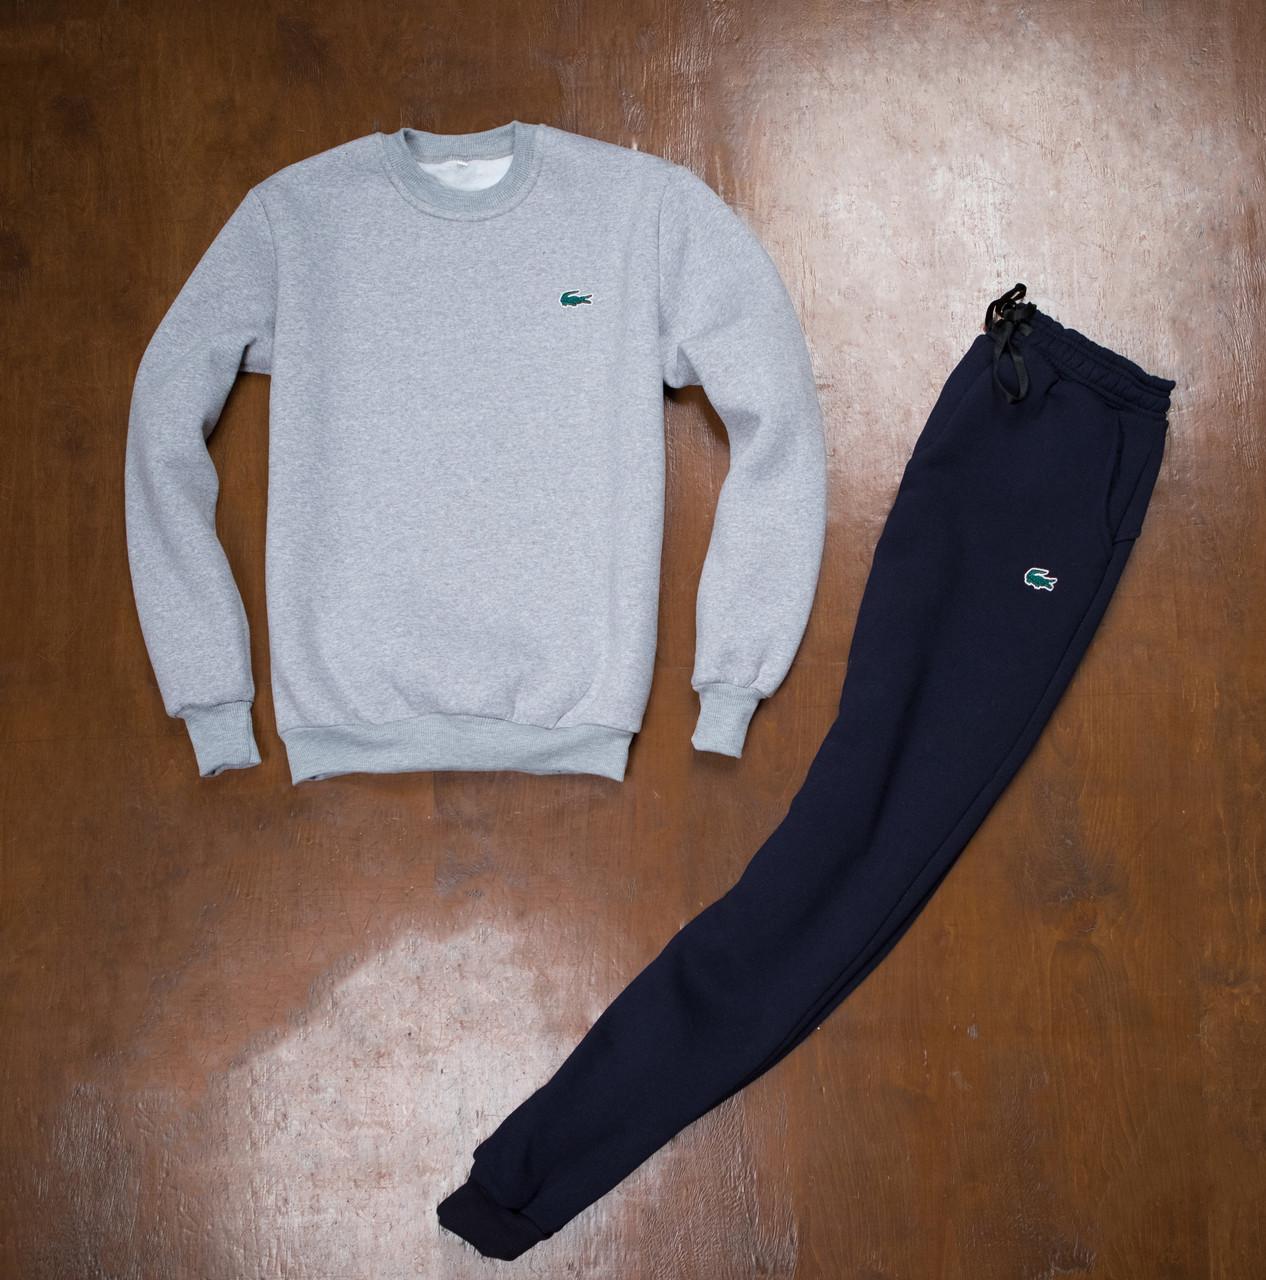 f917cb69704a Мужской зимний спортивный костюм Lacoste Grey/Navy: продажа, цена в ...